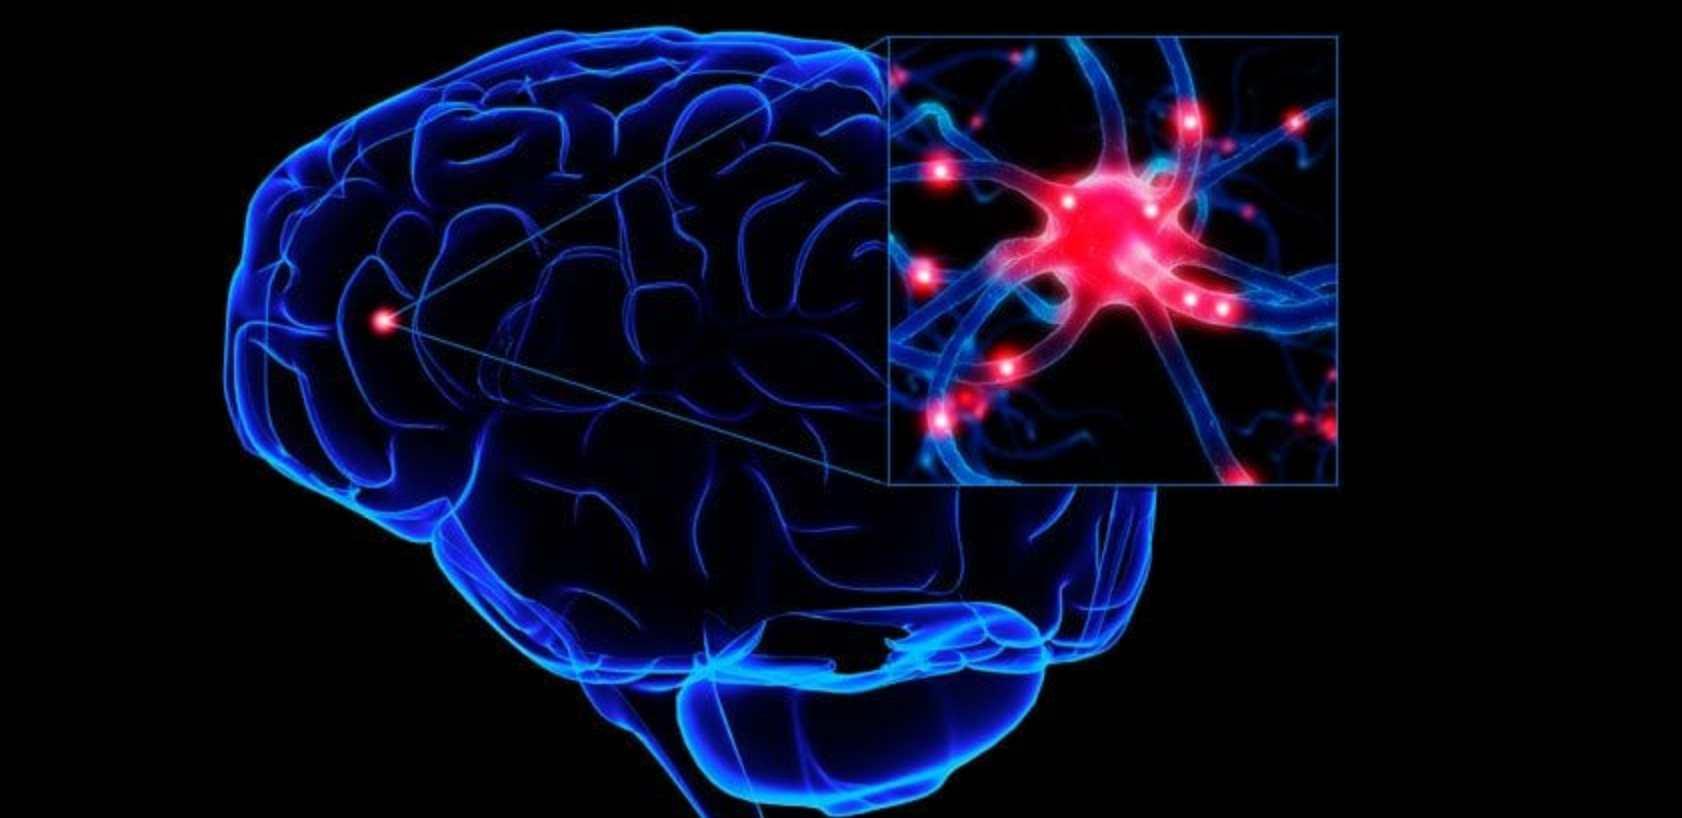 Reaksi Kimia Pada Otak